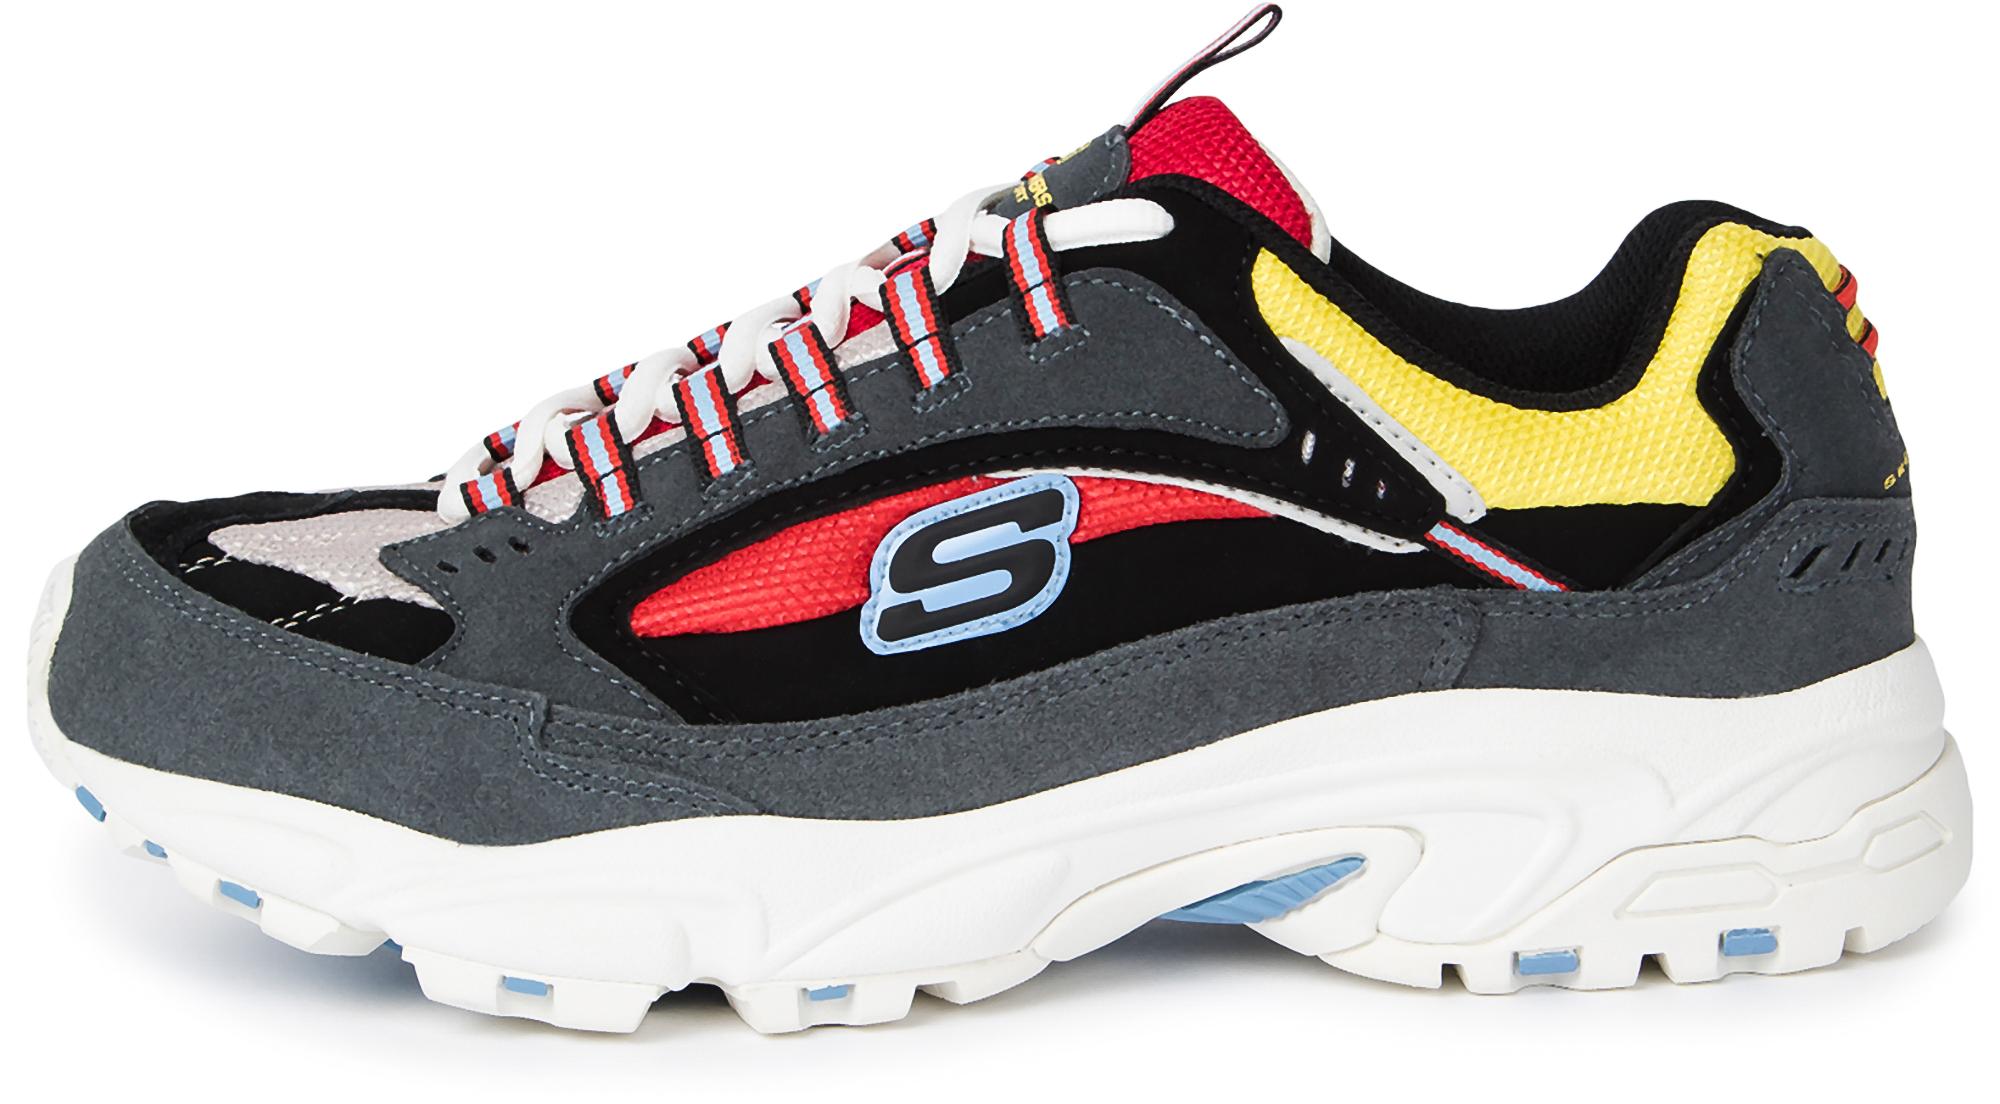 Фото - Skechers Кроссовки мужские Skechers Stamina Cutback, размер 45 кроссовки мужские твое цвет белый a4390 размер 45